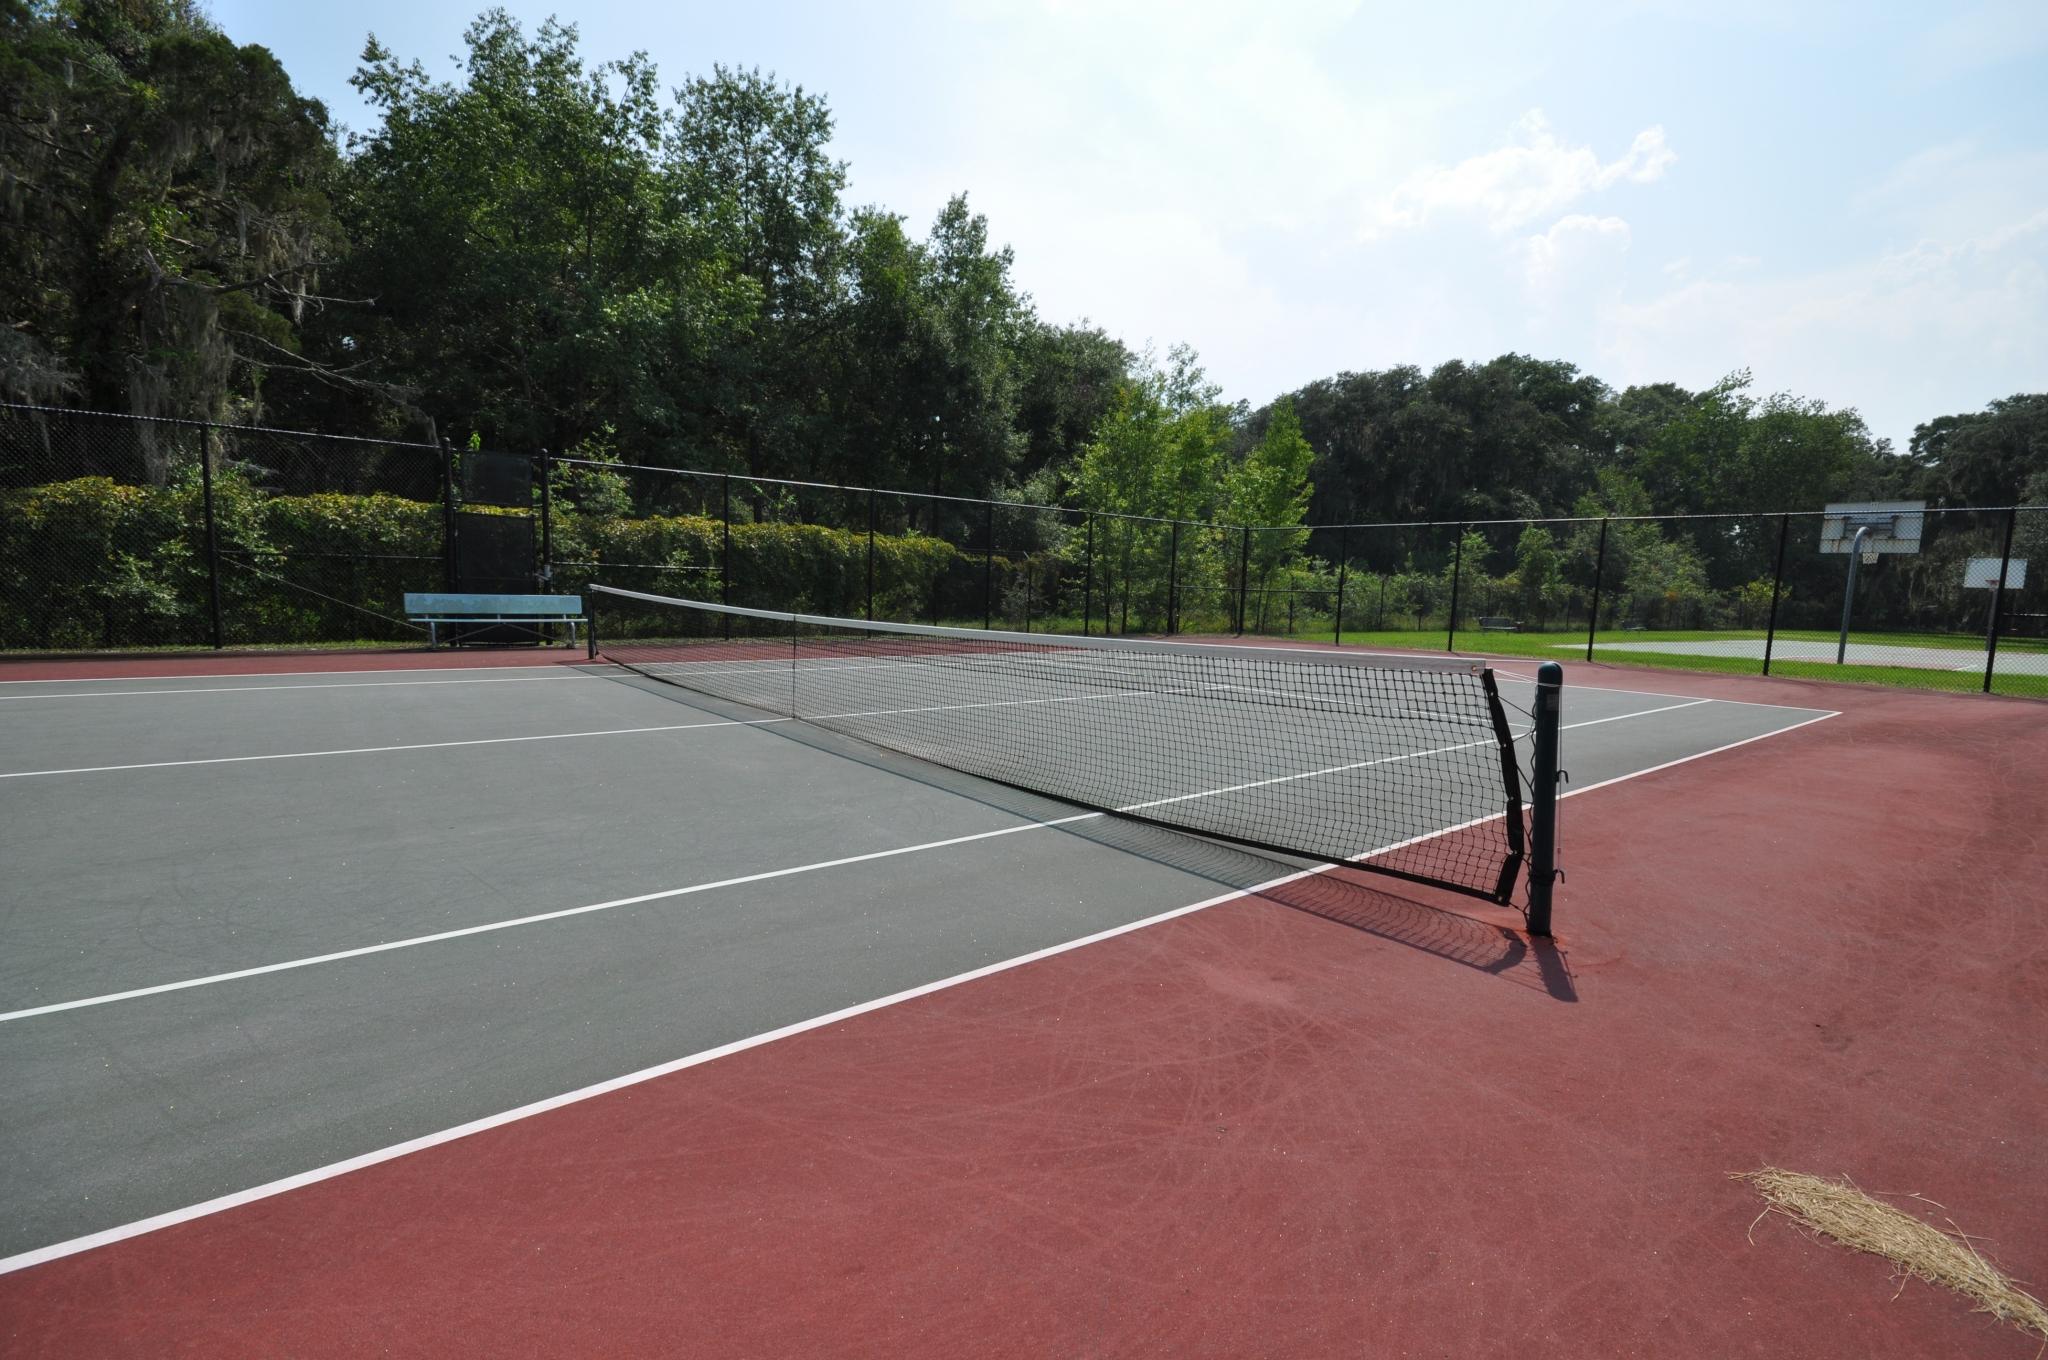 Tennis Court | Exterior Tennis Court | Outside Court | Naval Hospital Beaufort Sports |